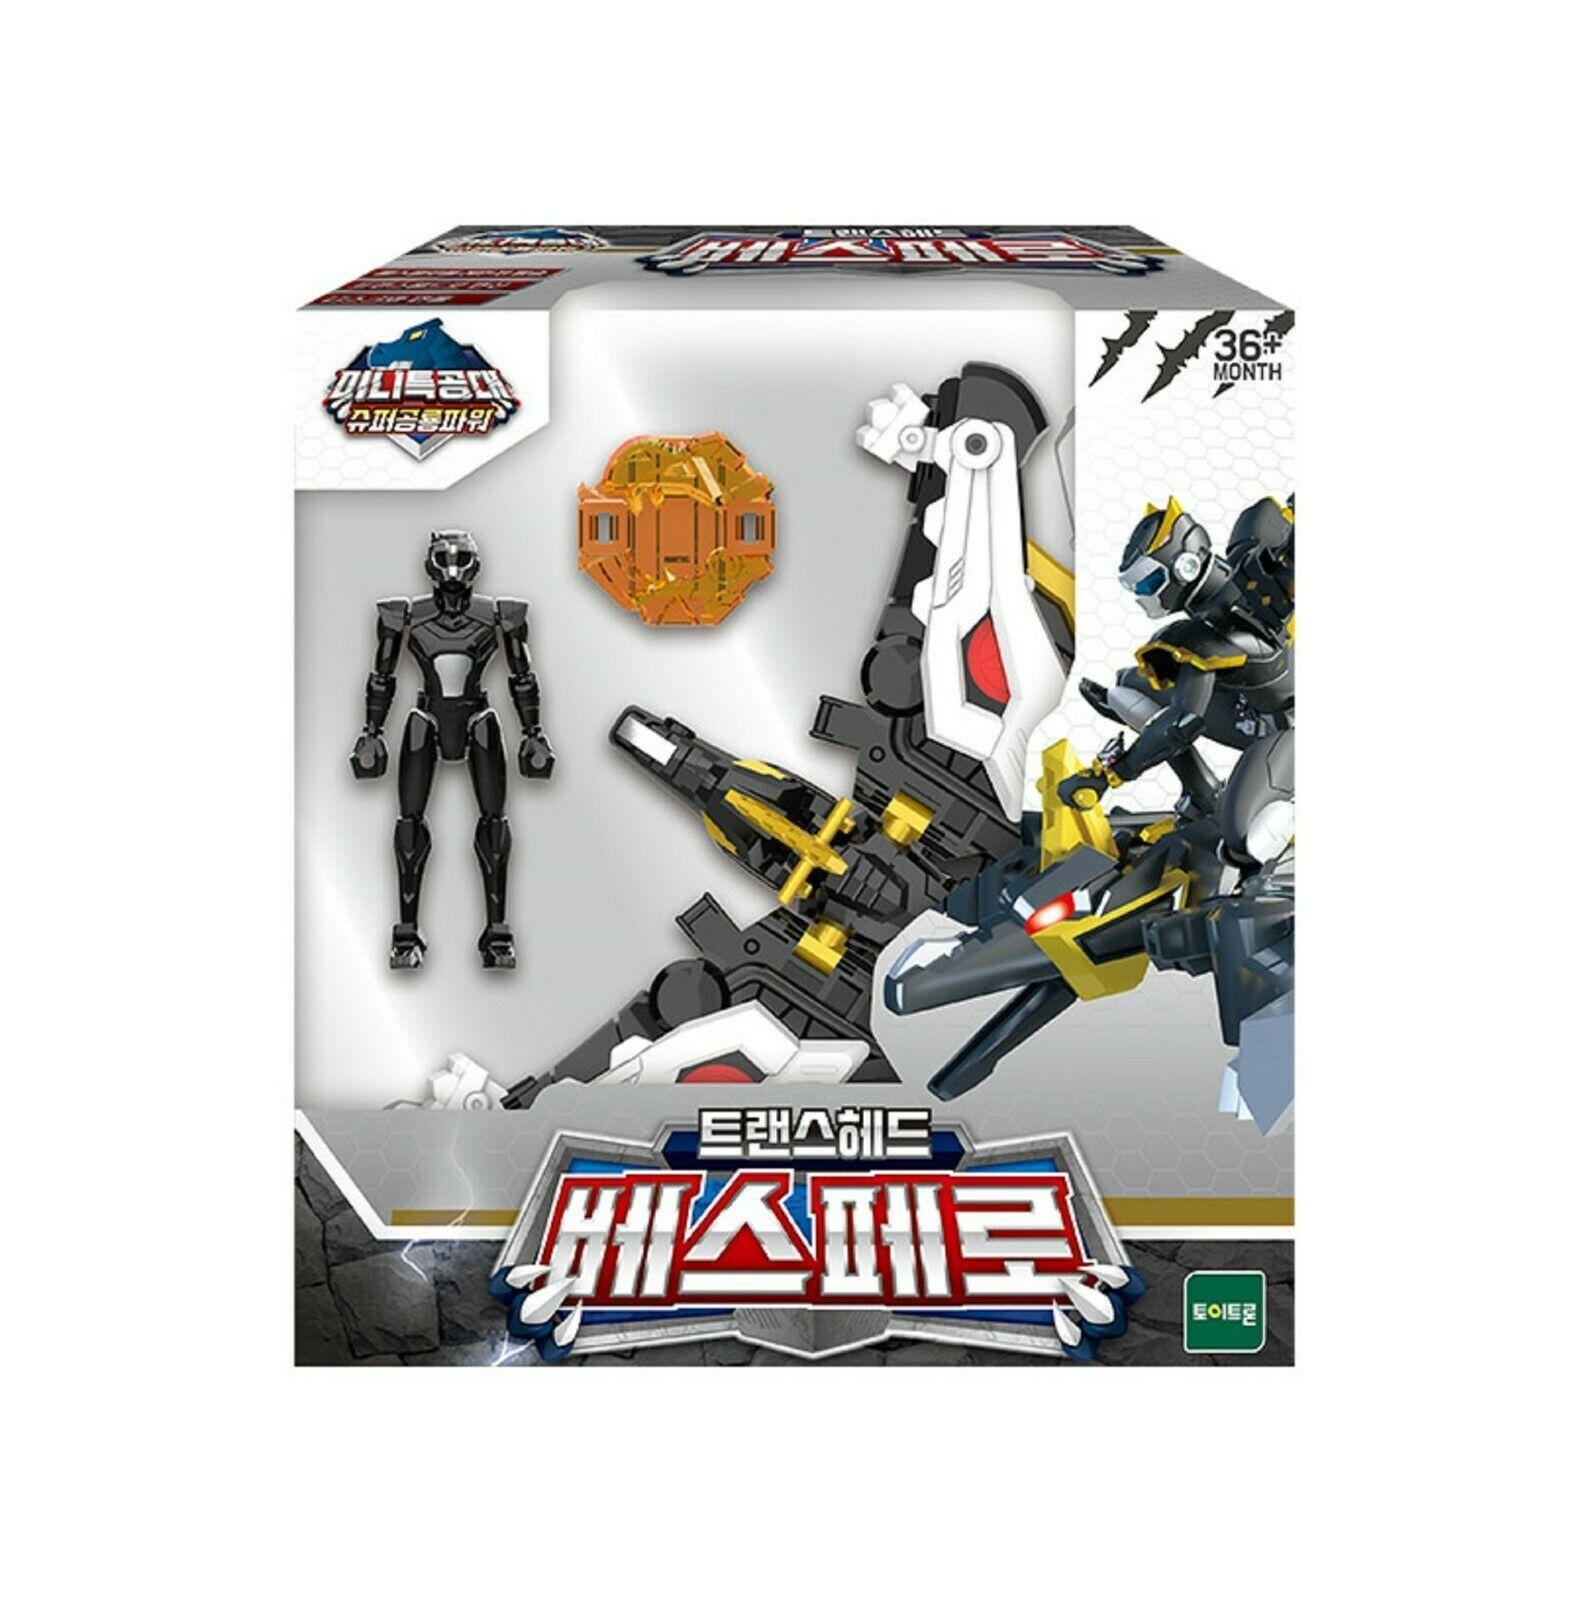 Miniforce Trans Head Vespero Super Dinosaur Power Action FIgure Toy